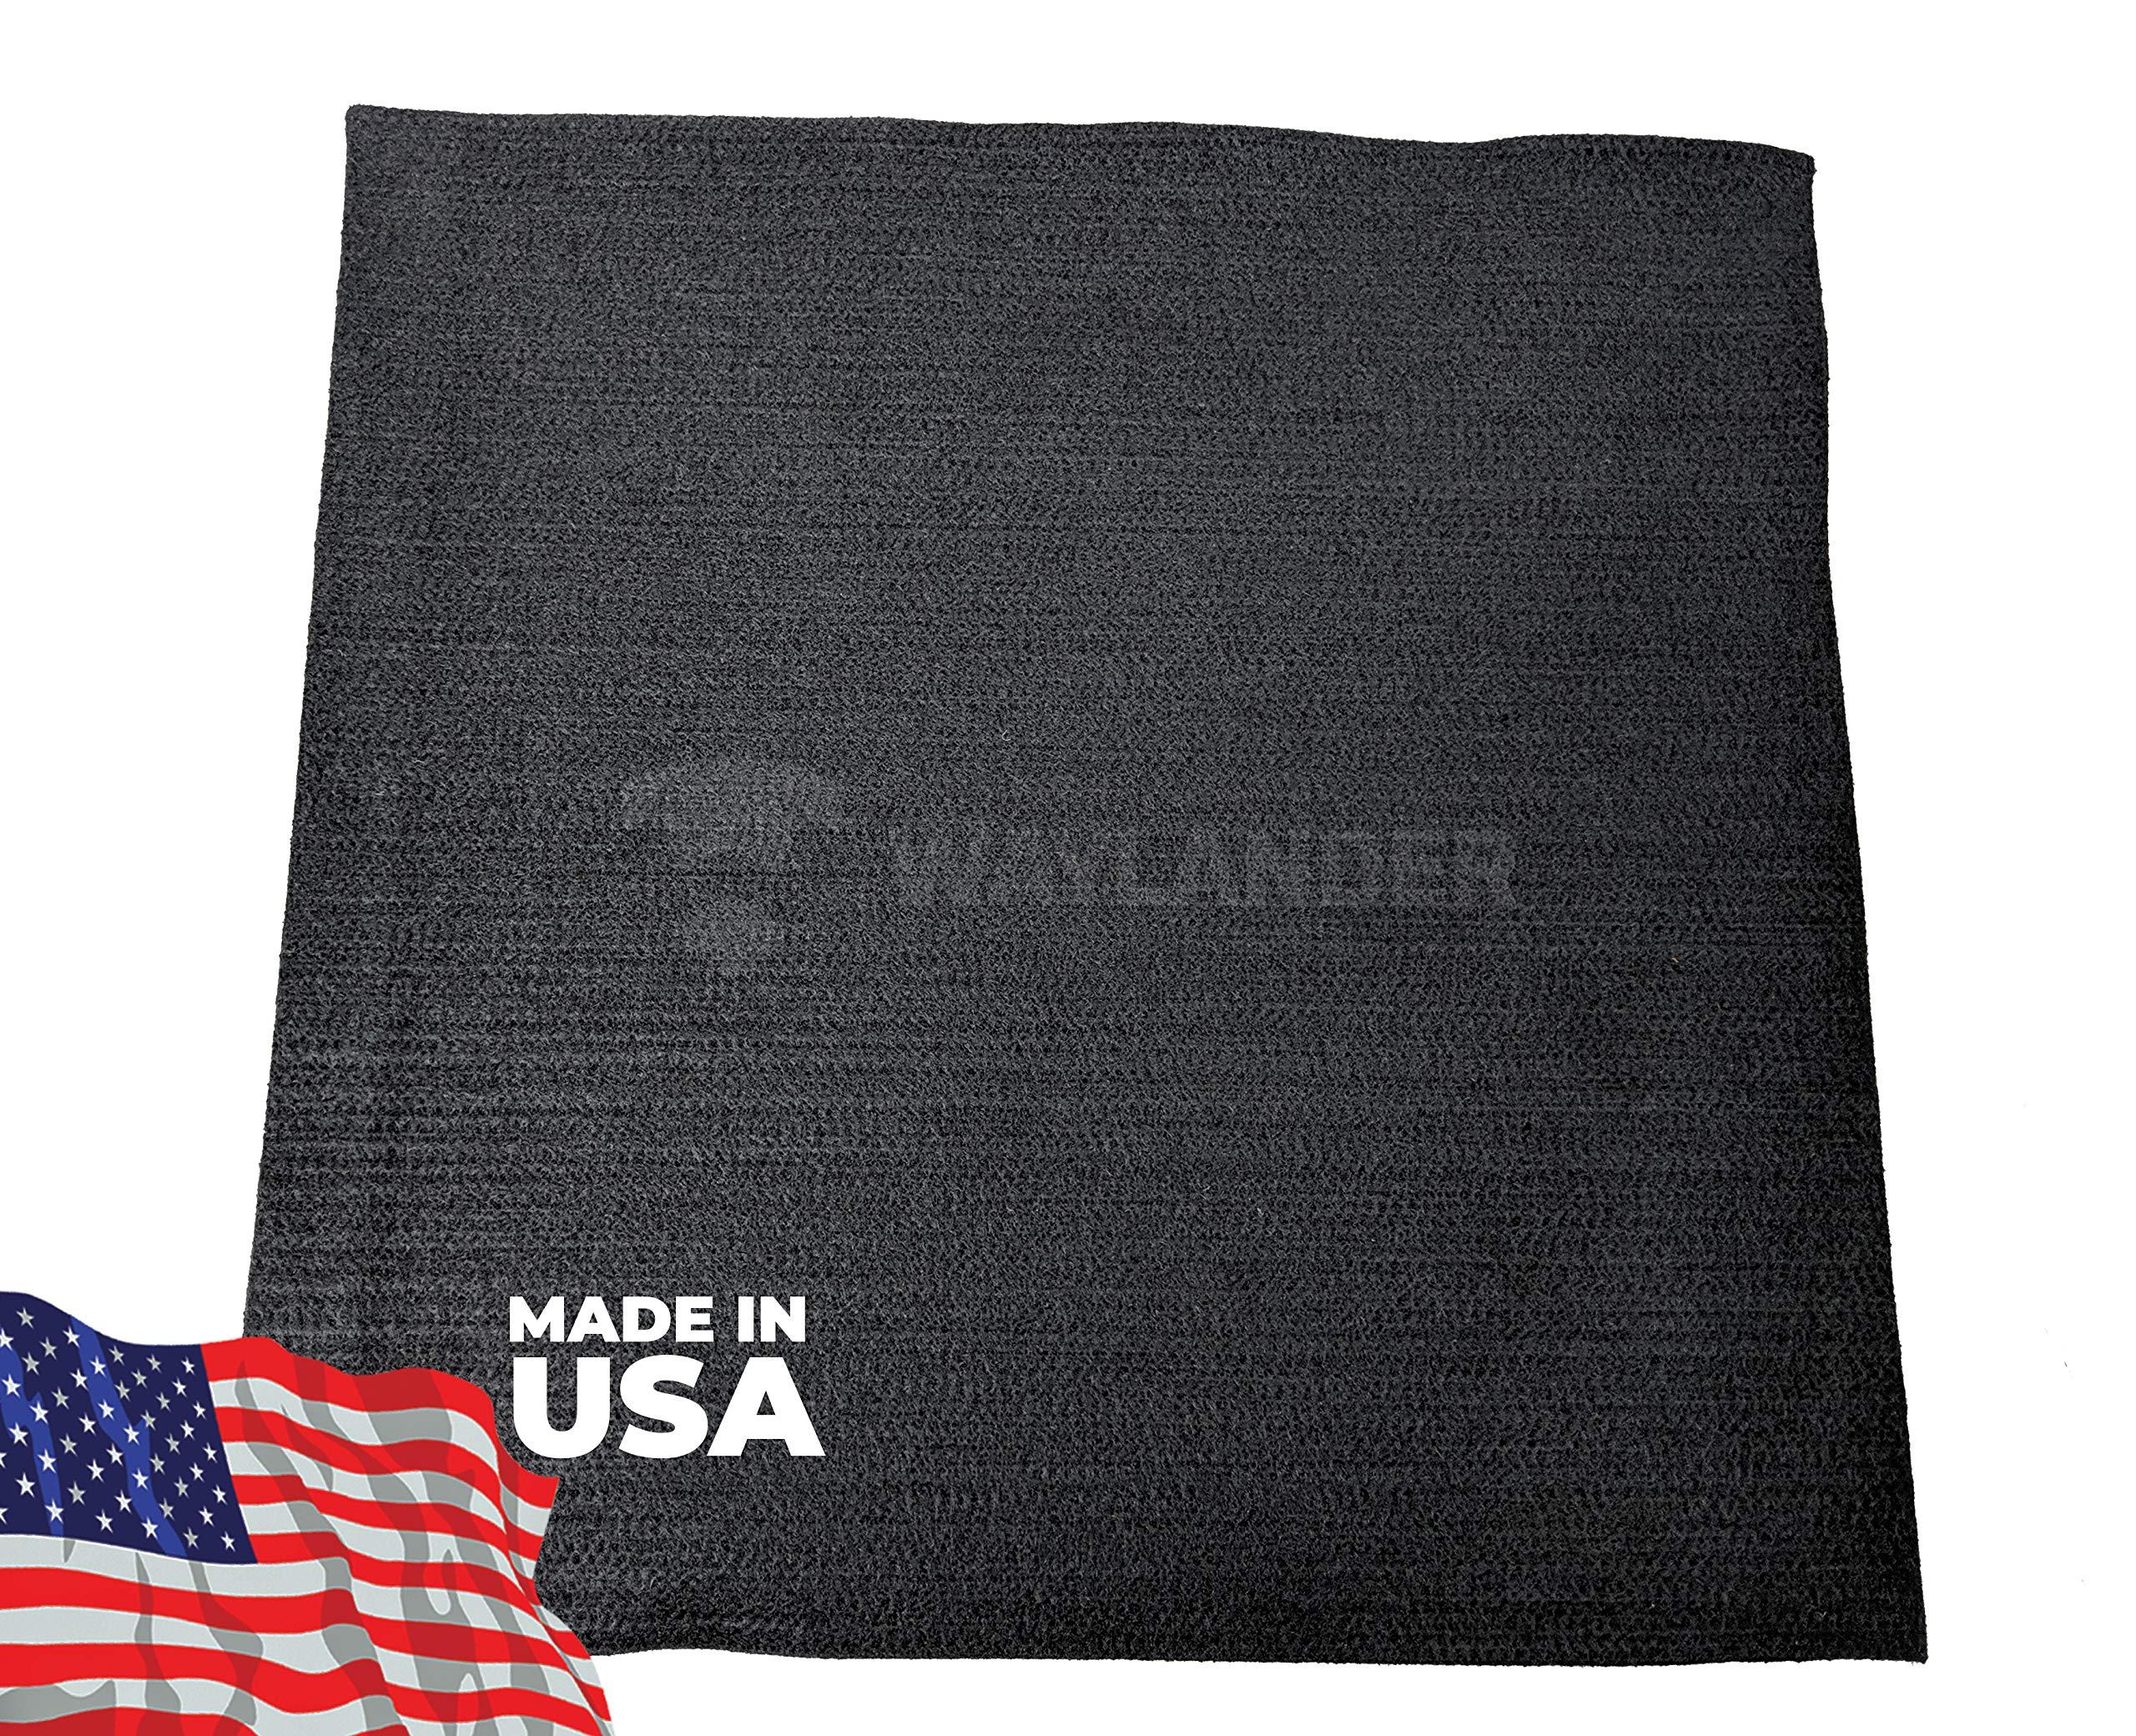 Waylander Welding Felt Carbon Fiber Welding Blanket Made in USA 1800°F High Temperature Resistant (36''x36'') by Waylander